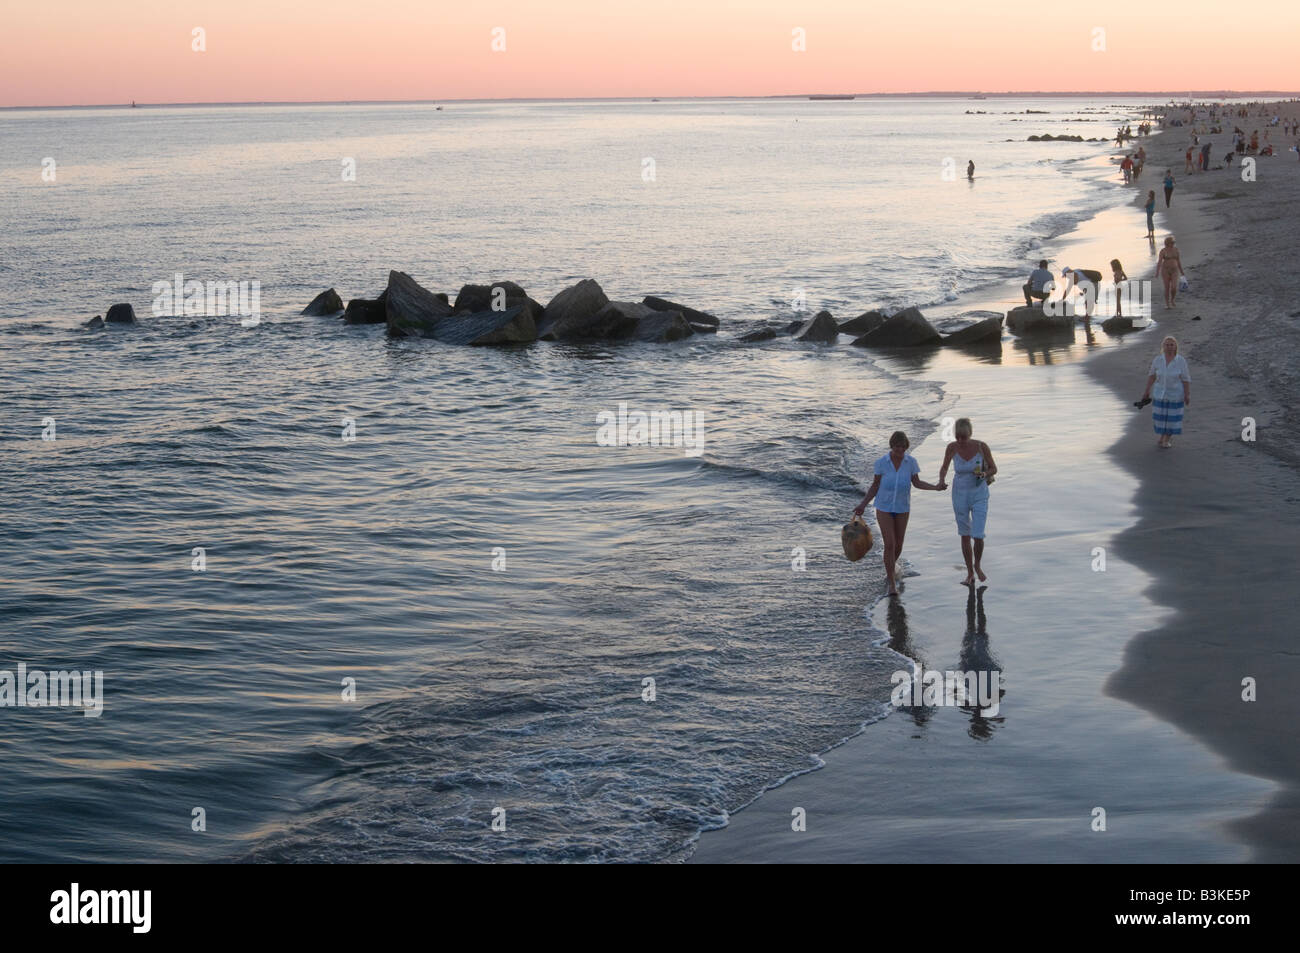 people-on-coney-island-beach-at-dusk-on-